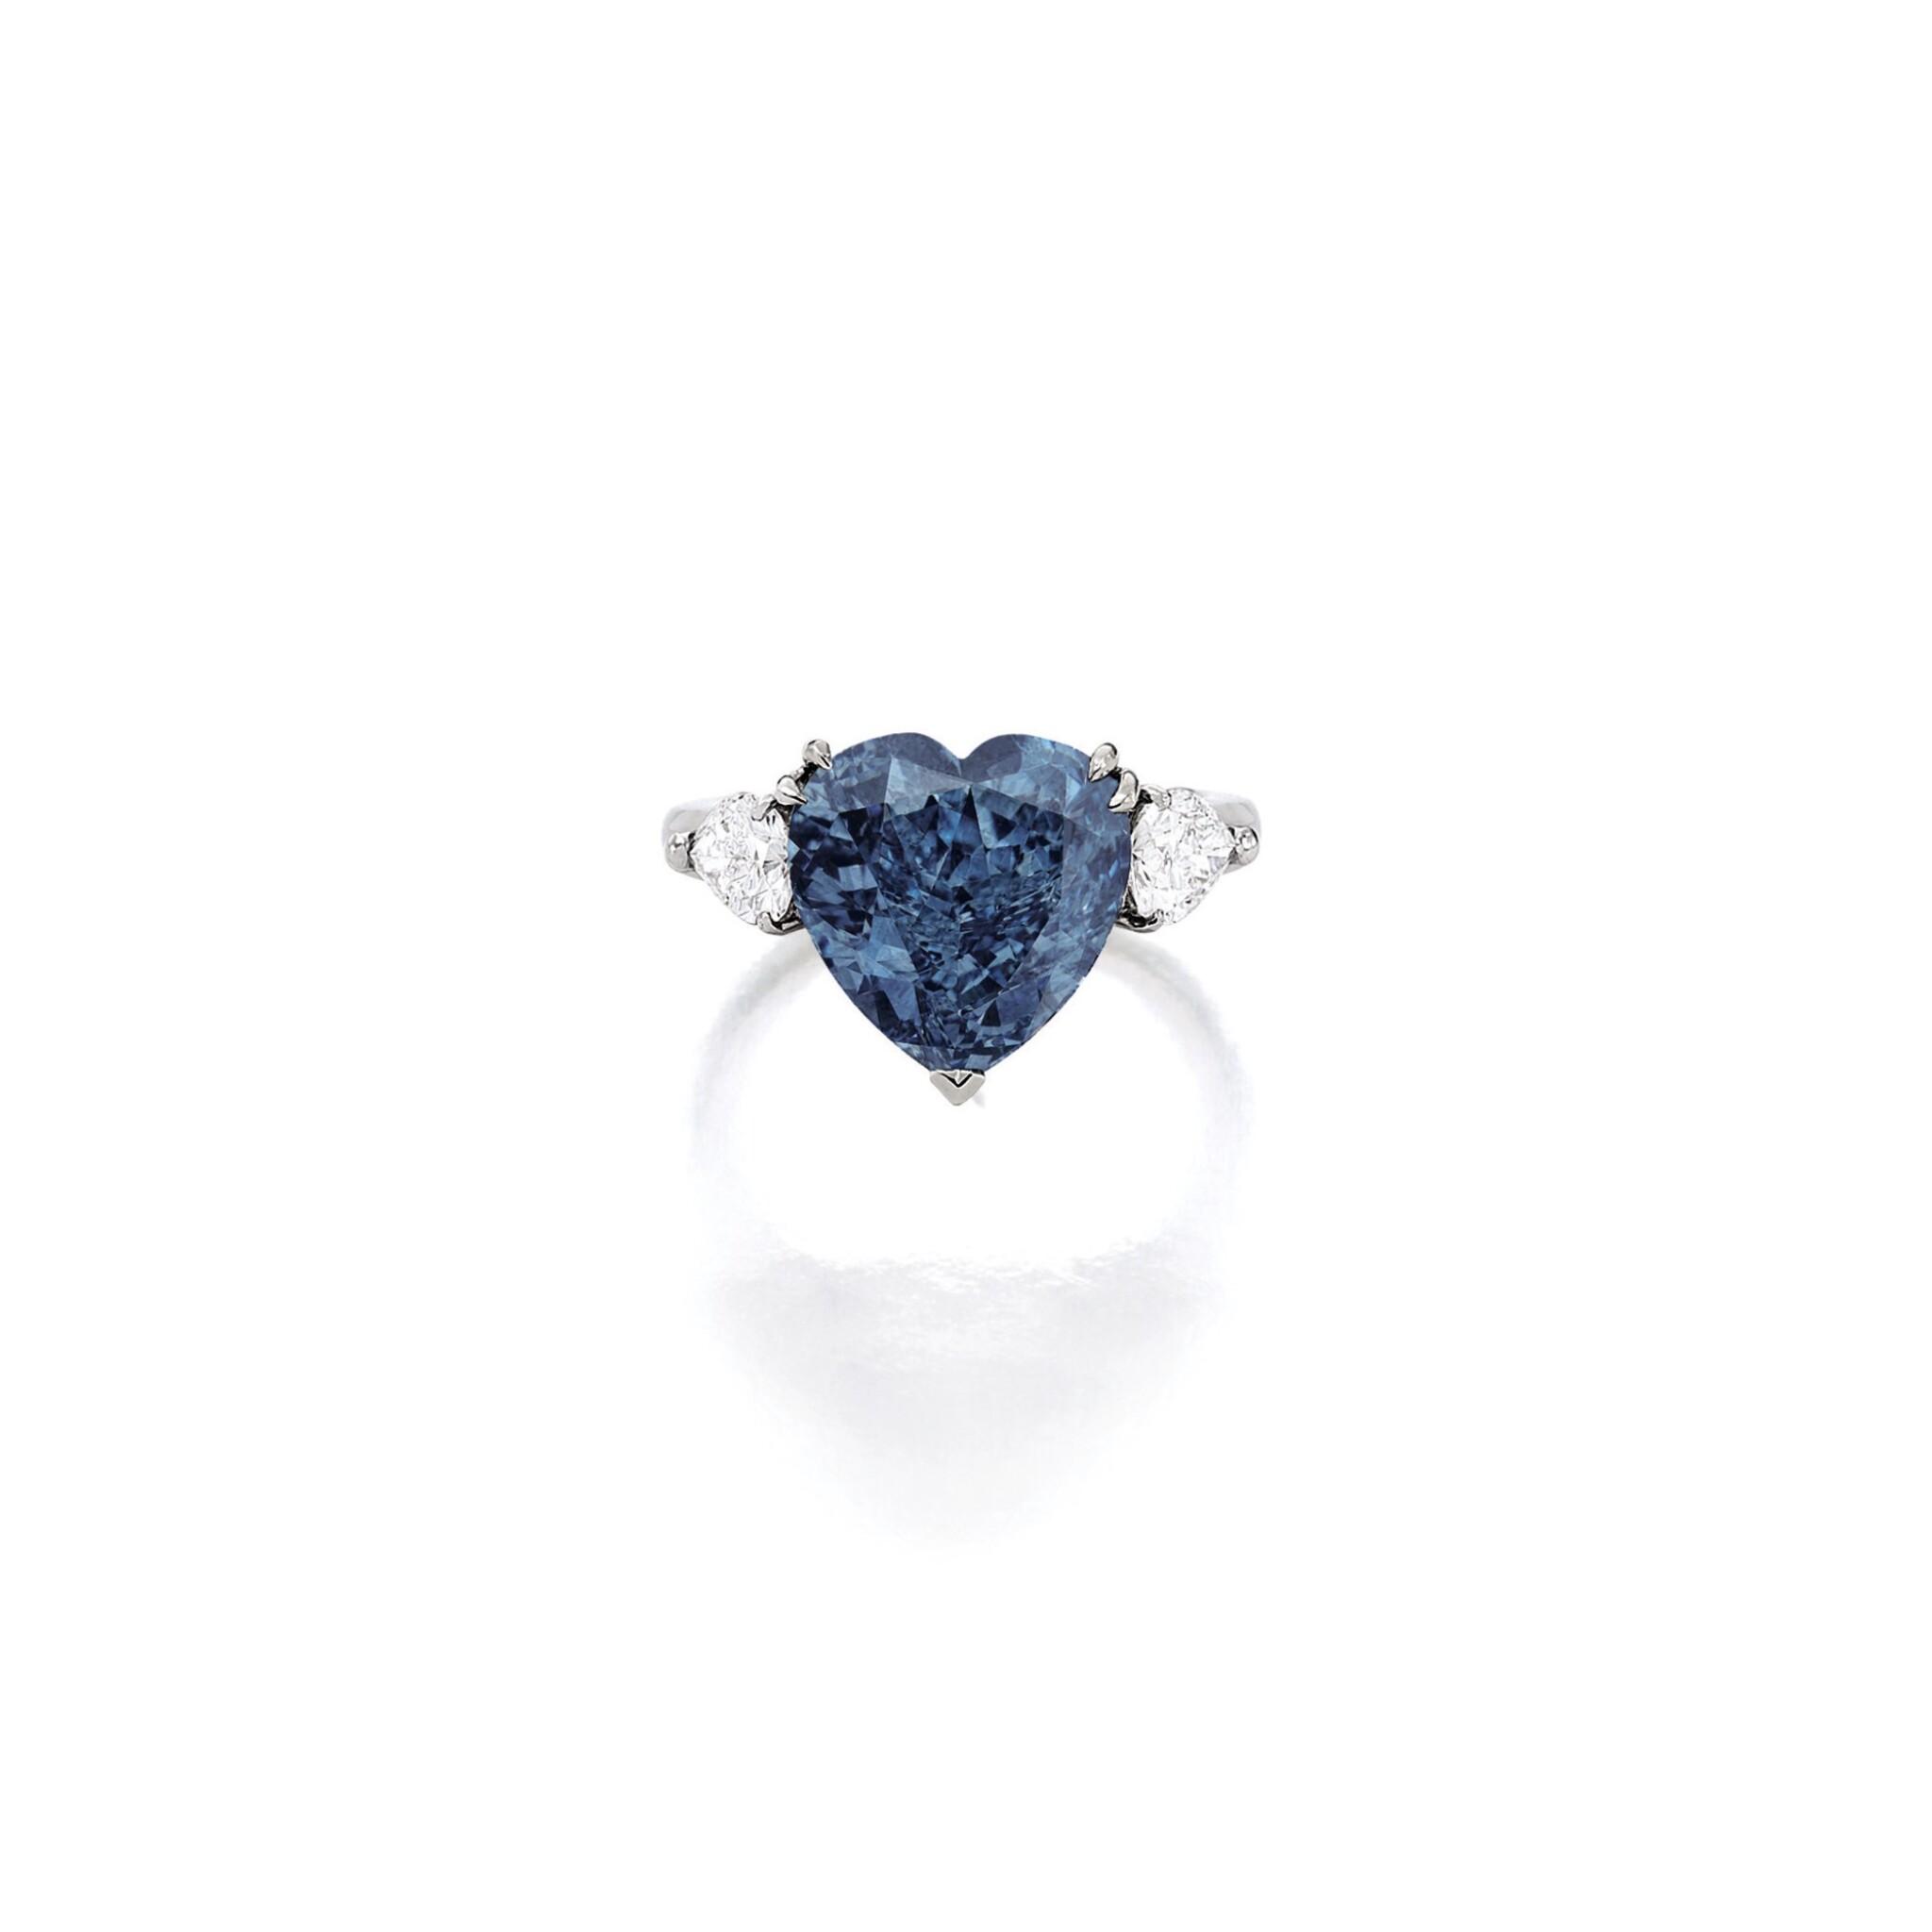 View full screen - View 1 of Lot 1806. A SUPERB FANCY VIVID BLUE DIAMOND AND DIAMOND RING  5.04卡拉 心形 艷彩藍色 VS2淨度 鑽石 配 鑽石 戒指.